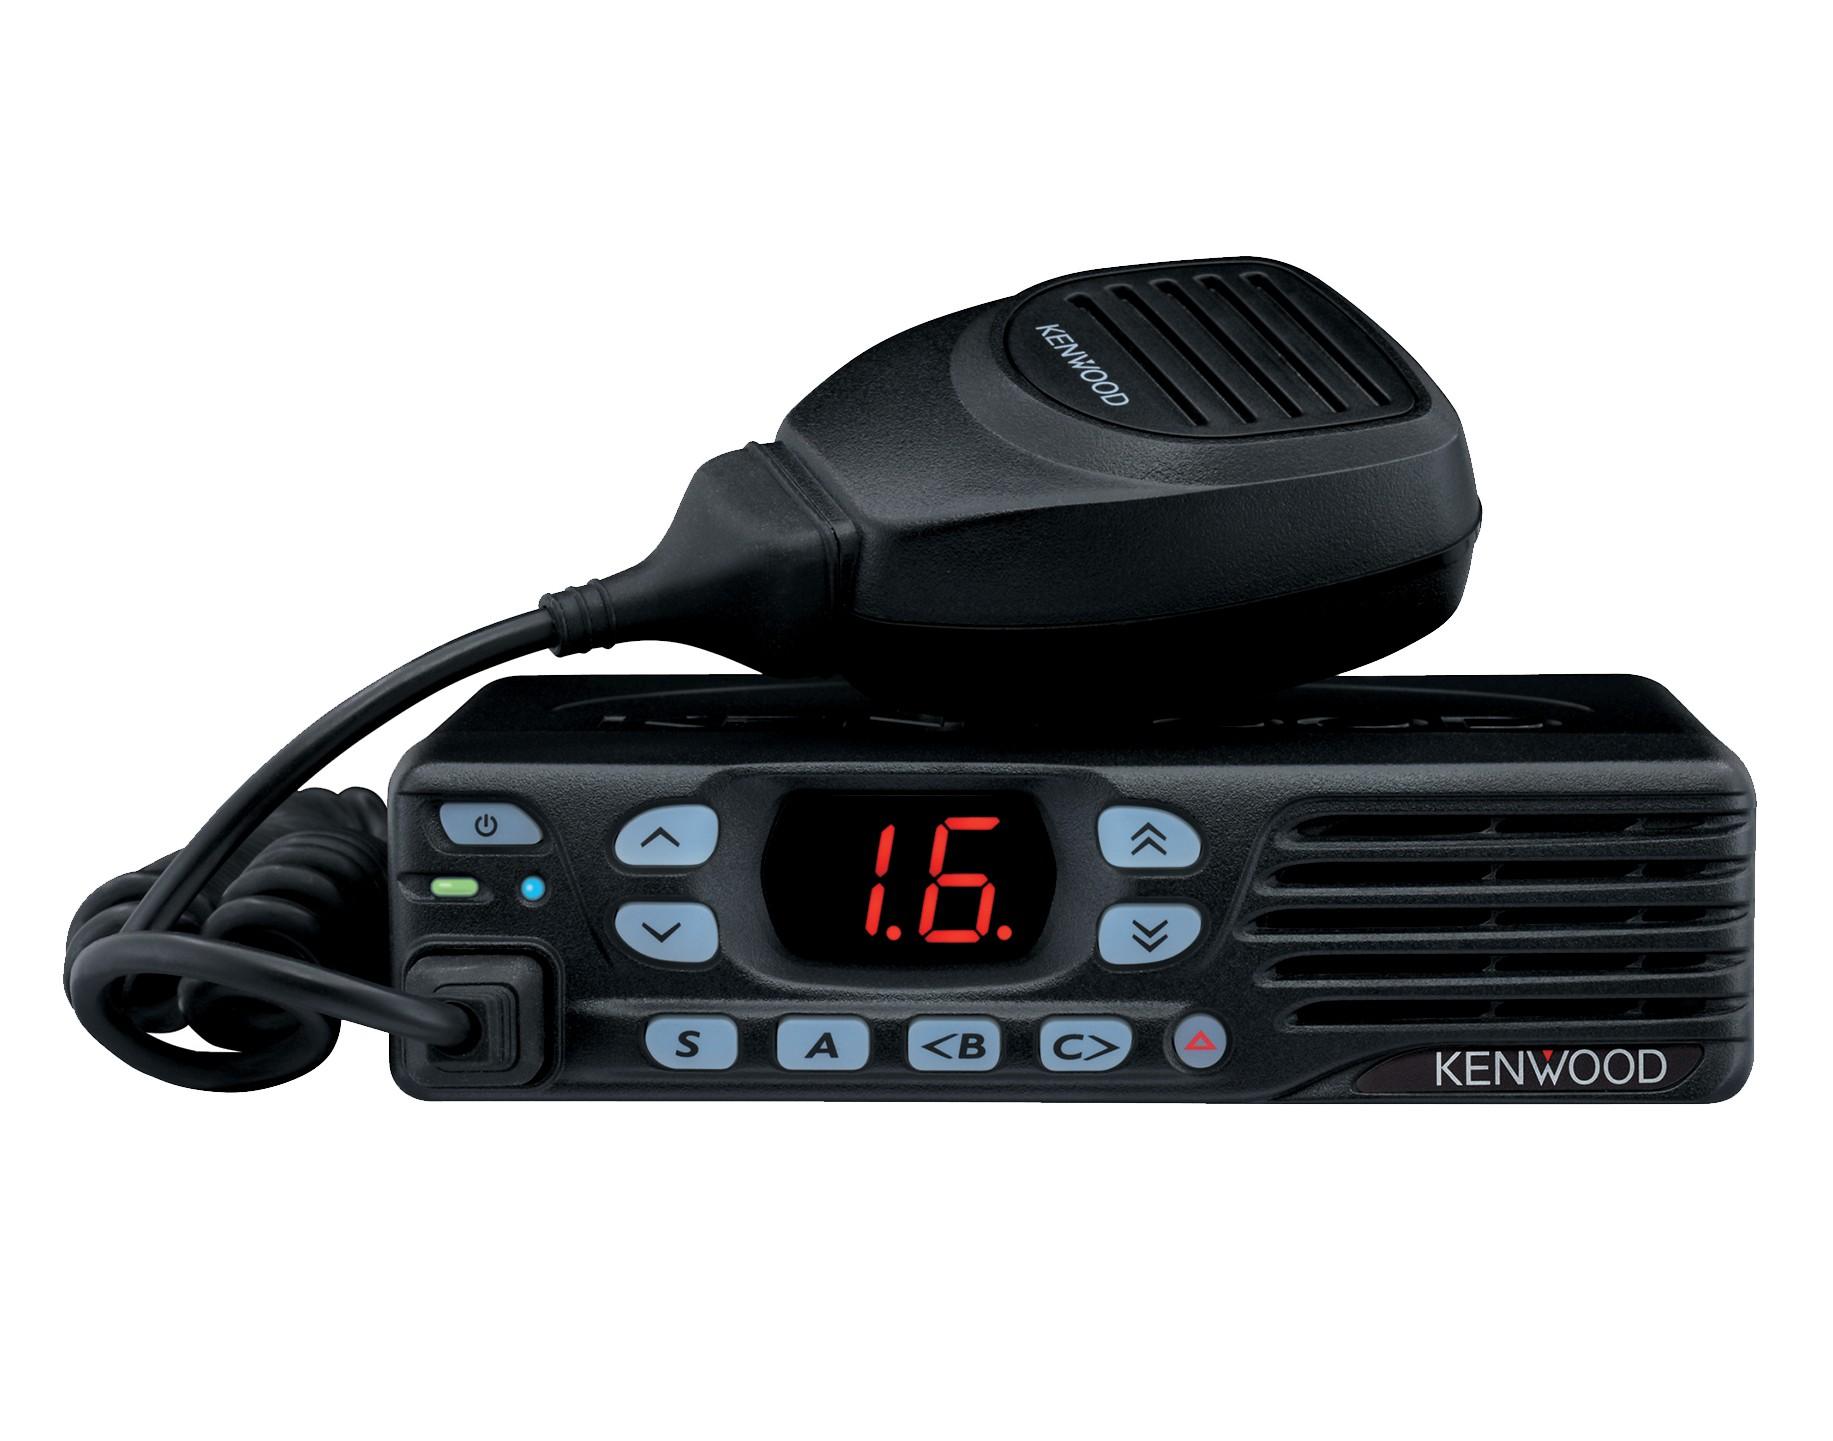 Kenwood tk7302 software download